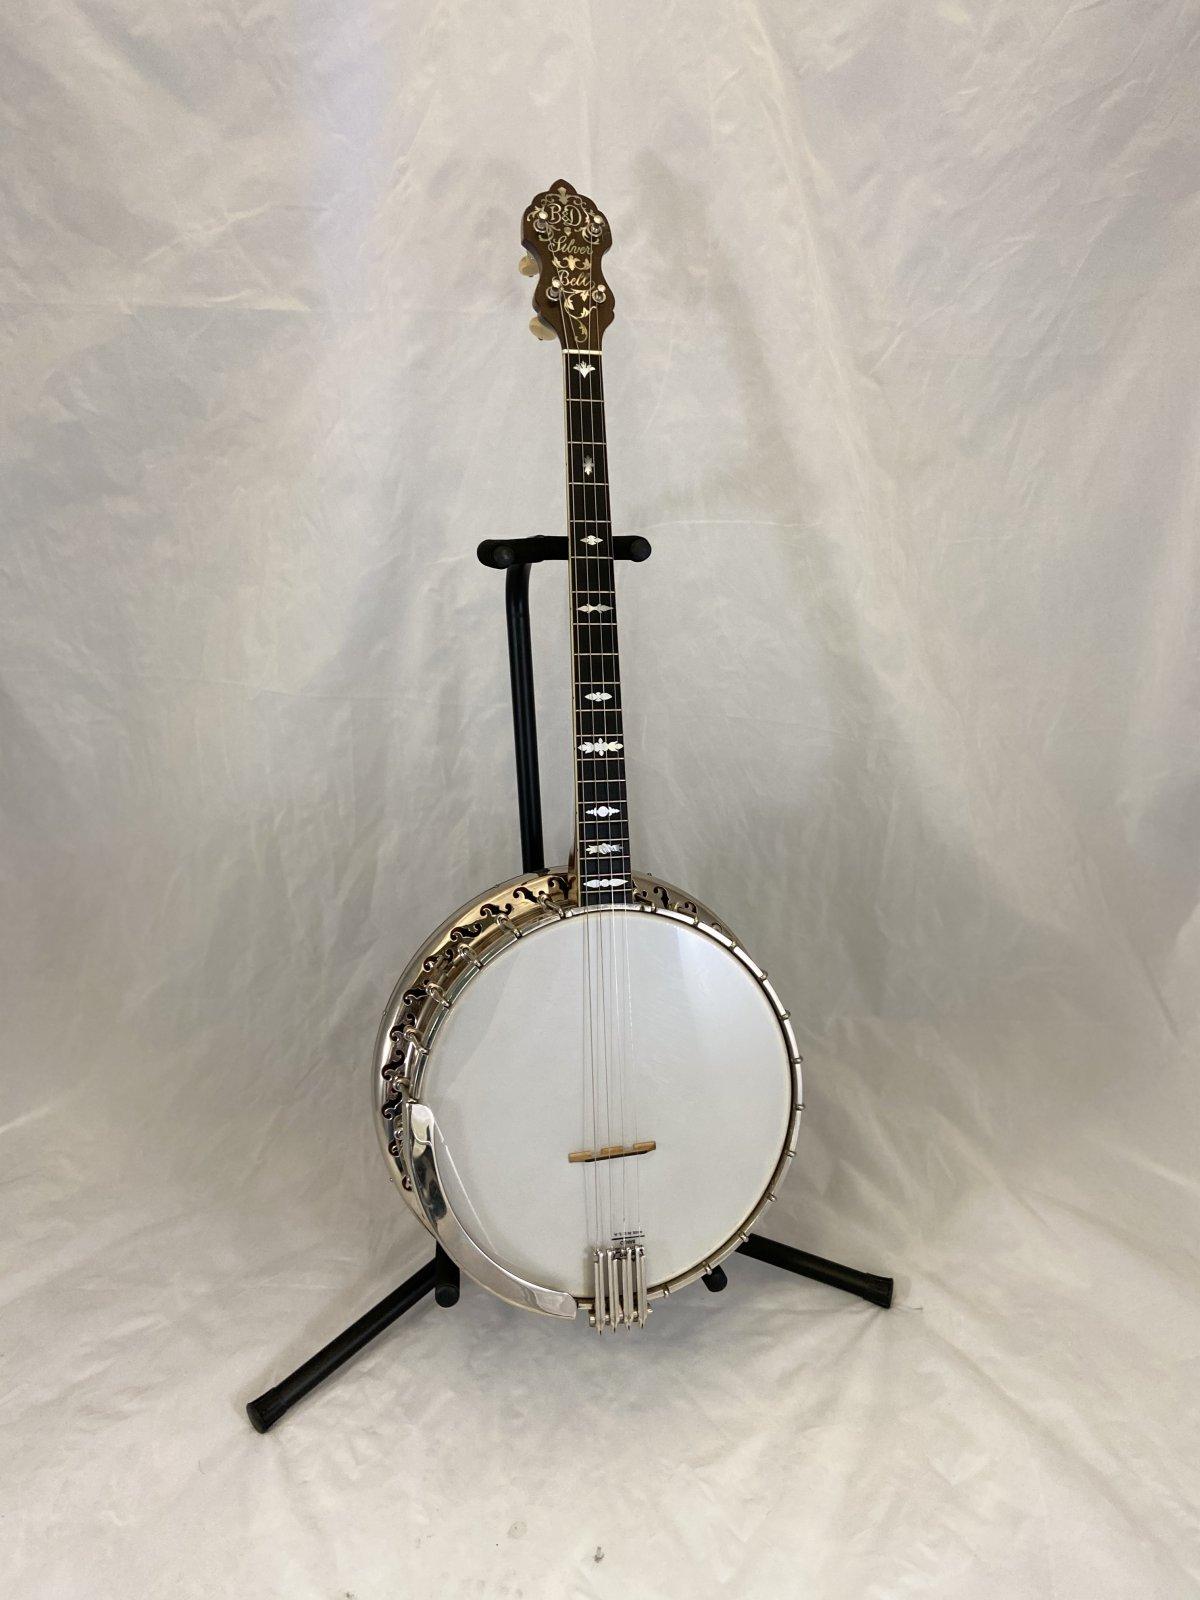 Preowned Bacon & Day 1927 Silver Bell No. 1 Tenor Banjo w/Case